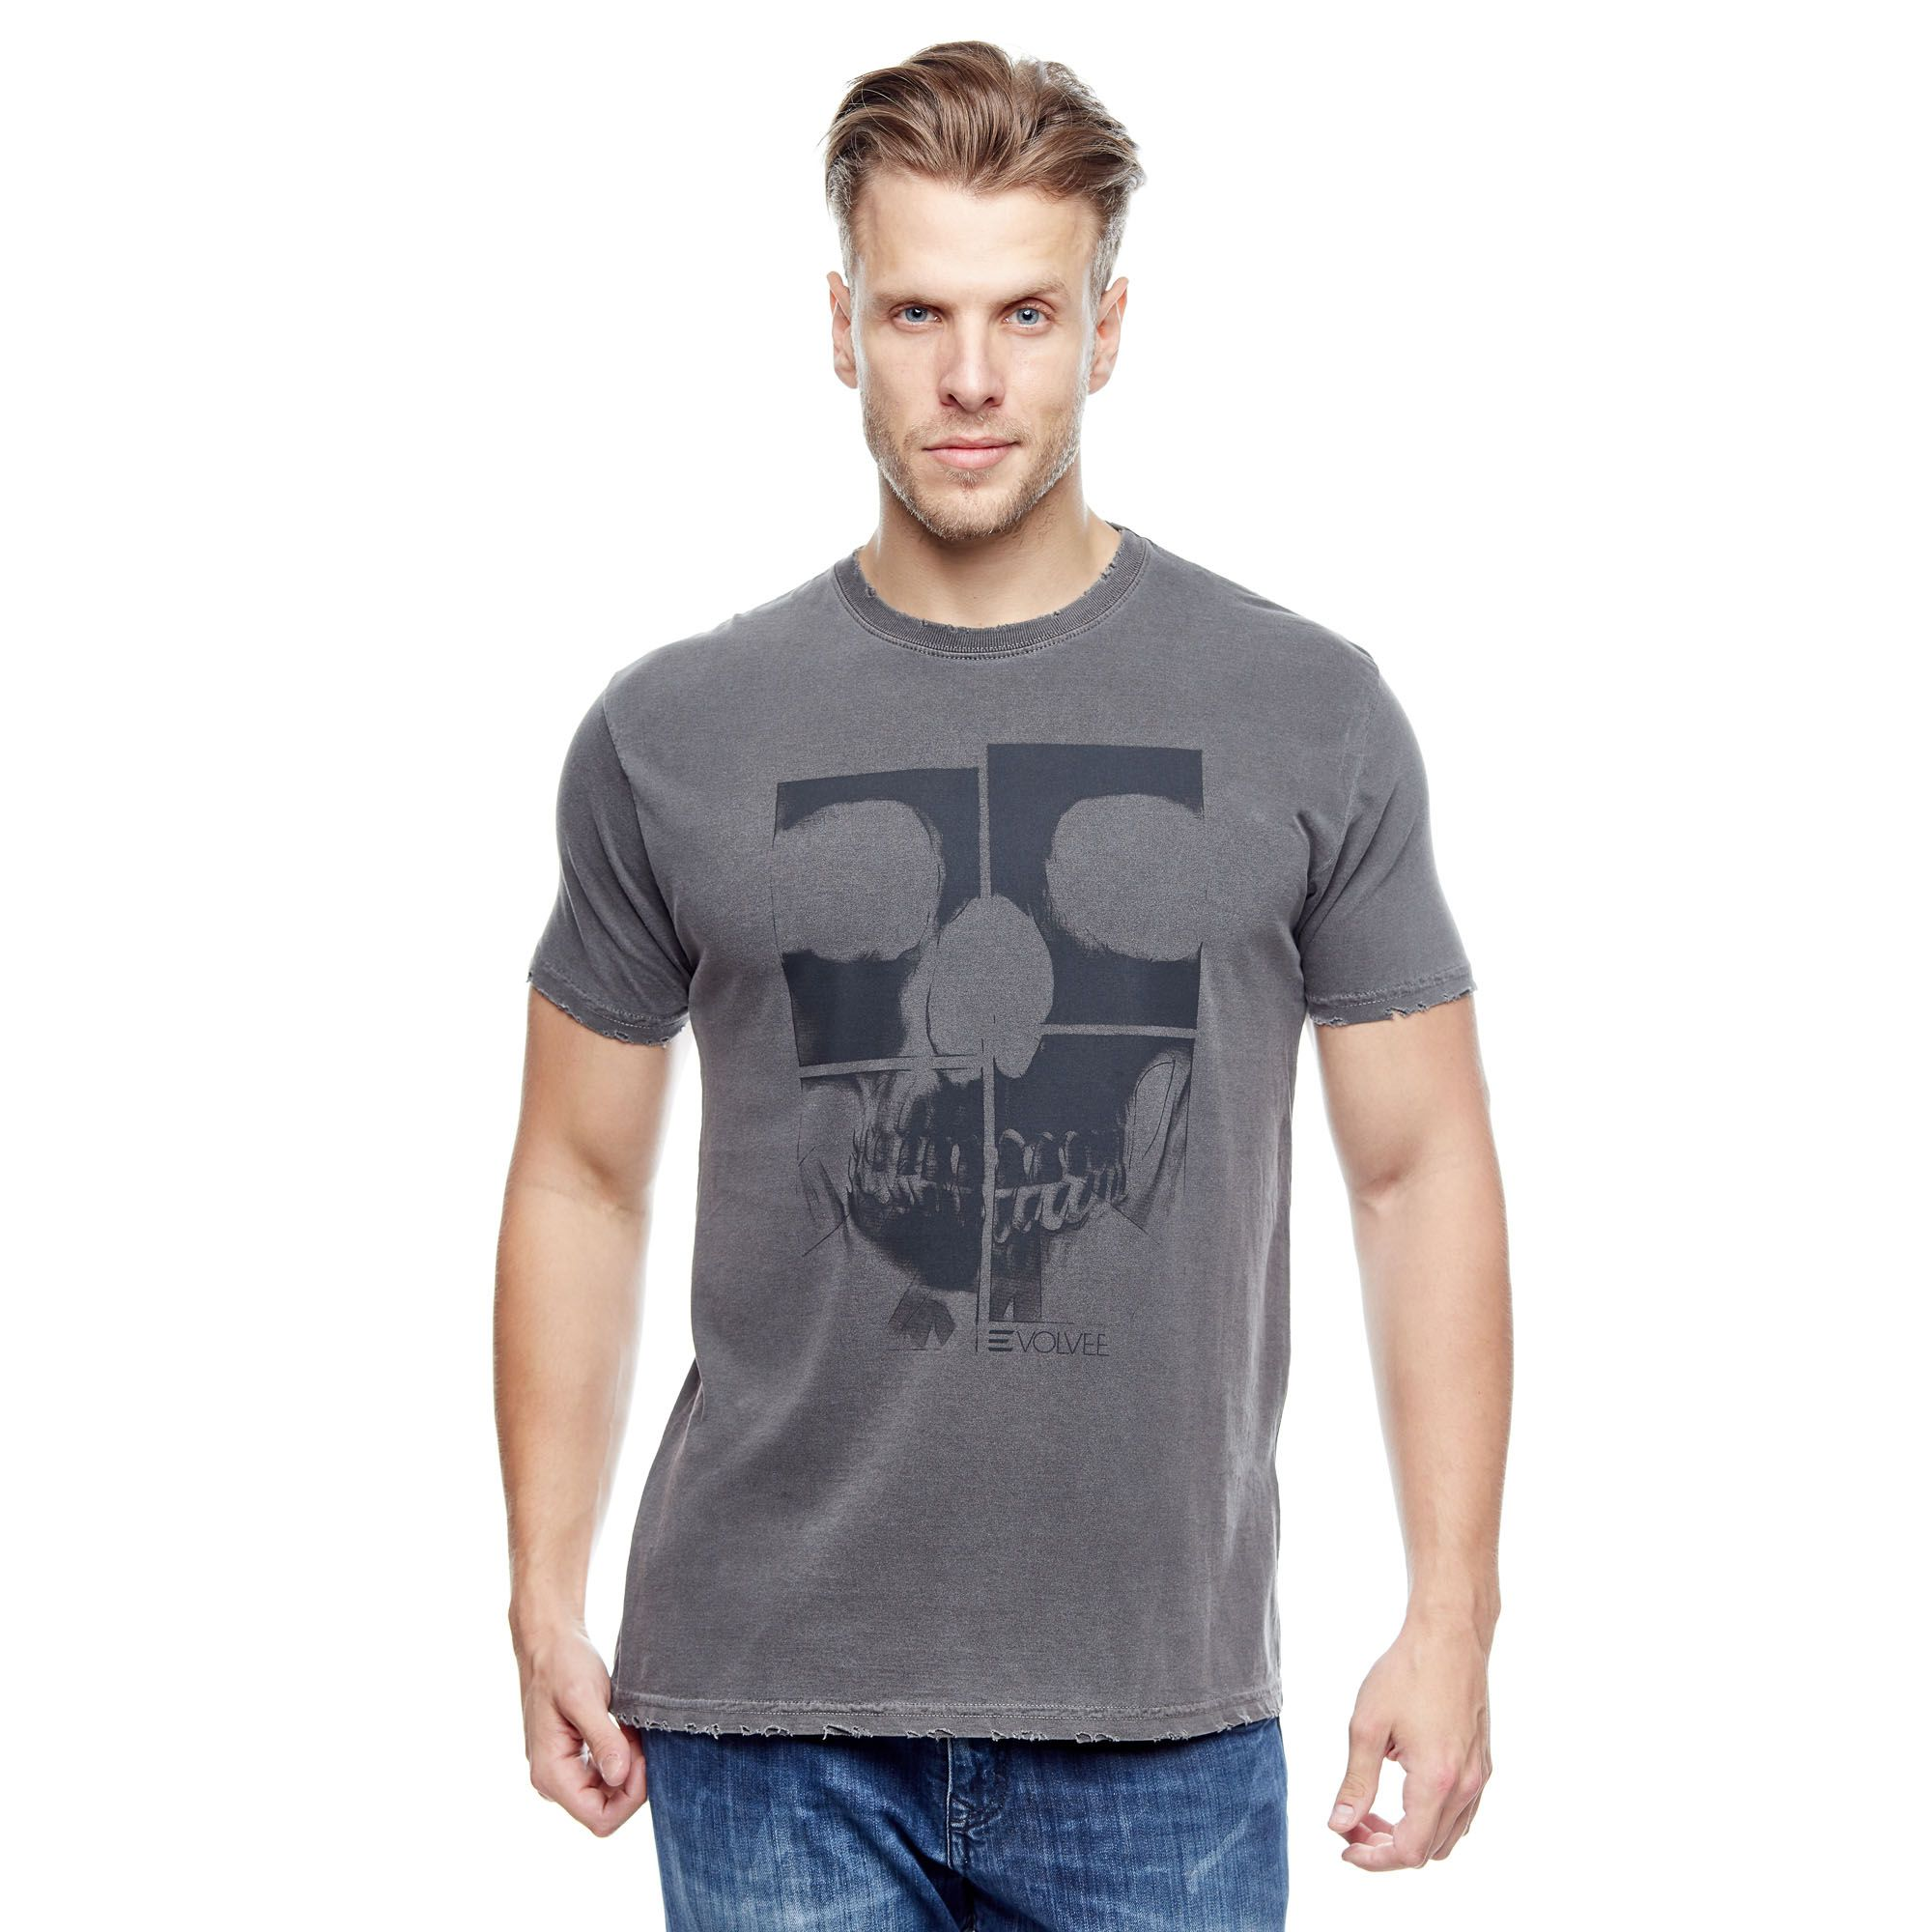 Camiseta Evolvee Raio-X Masculina